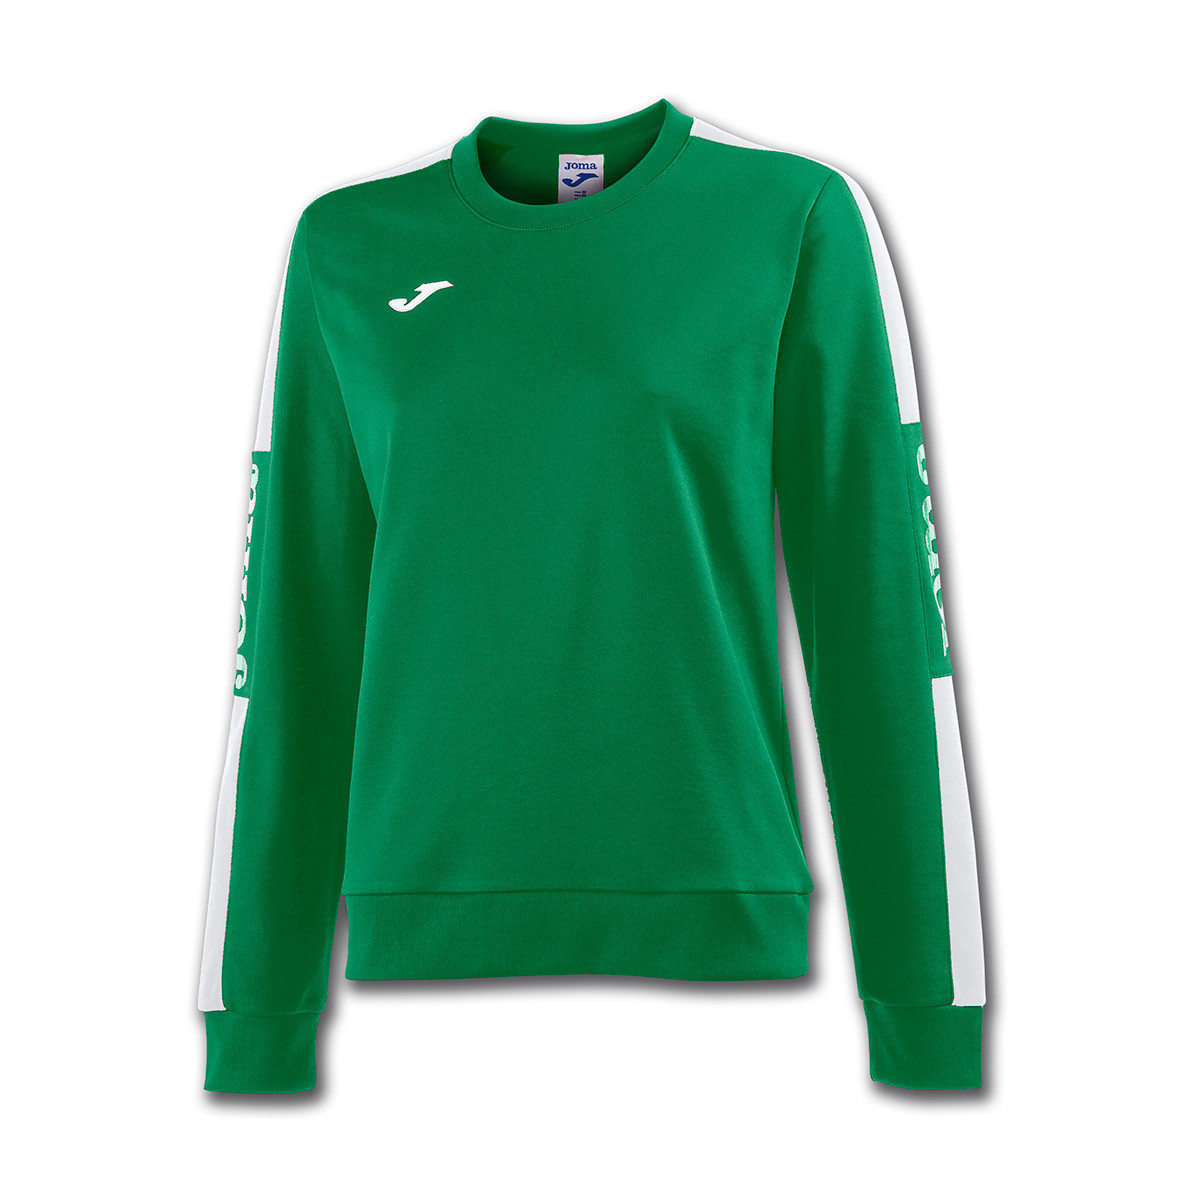 joma jersey mexico, Joma Champion II Sweatshirt Felpe Bianco